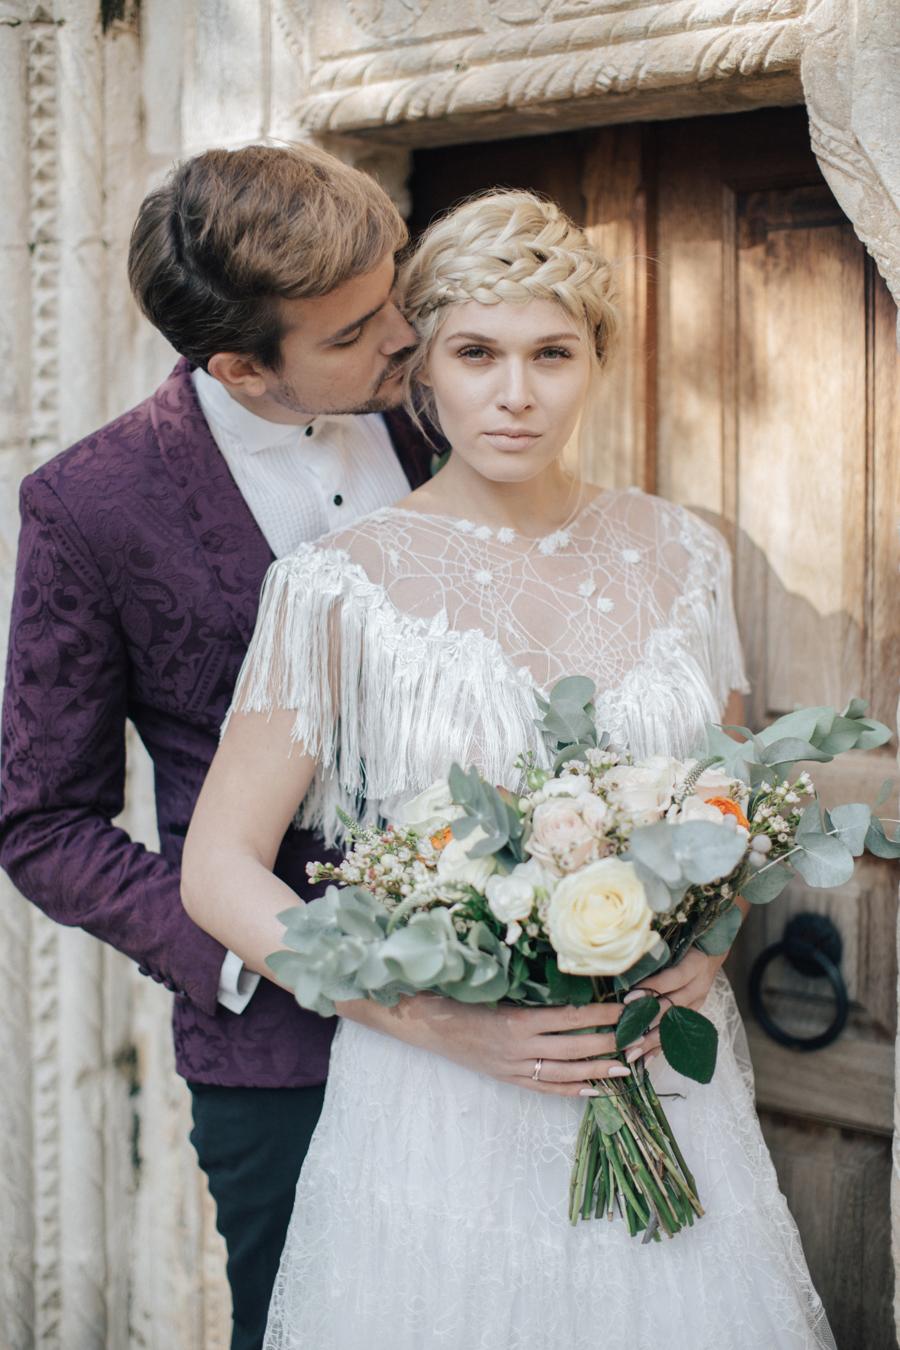 An_early_spring_wedding_inspiration_in_Cretan_highlands_0070[1]